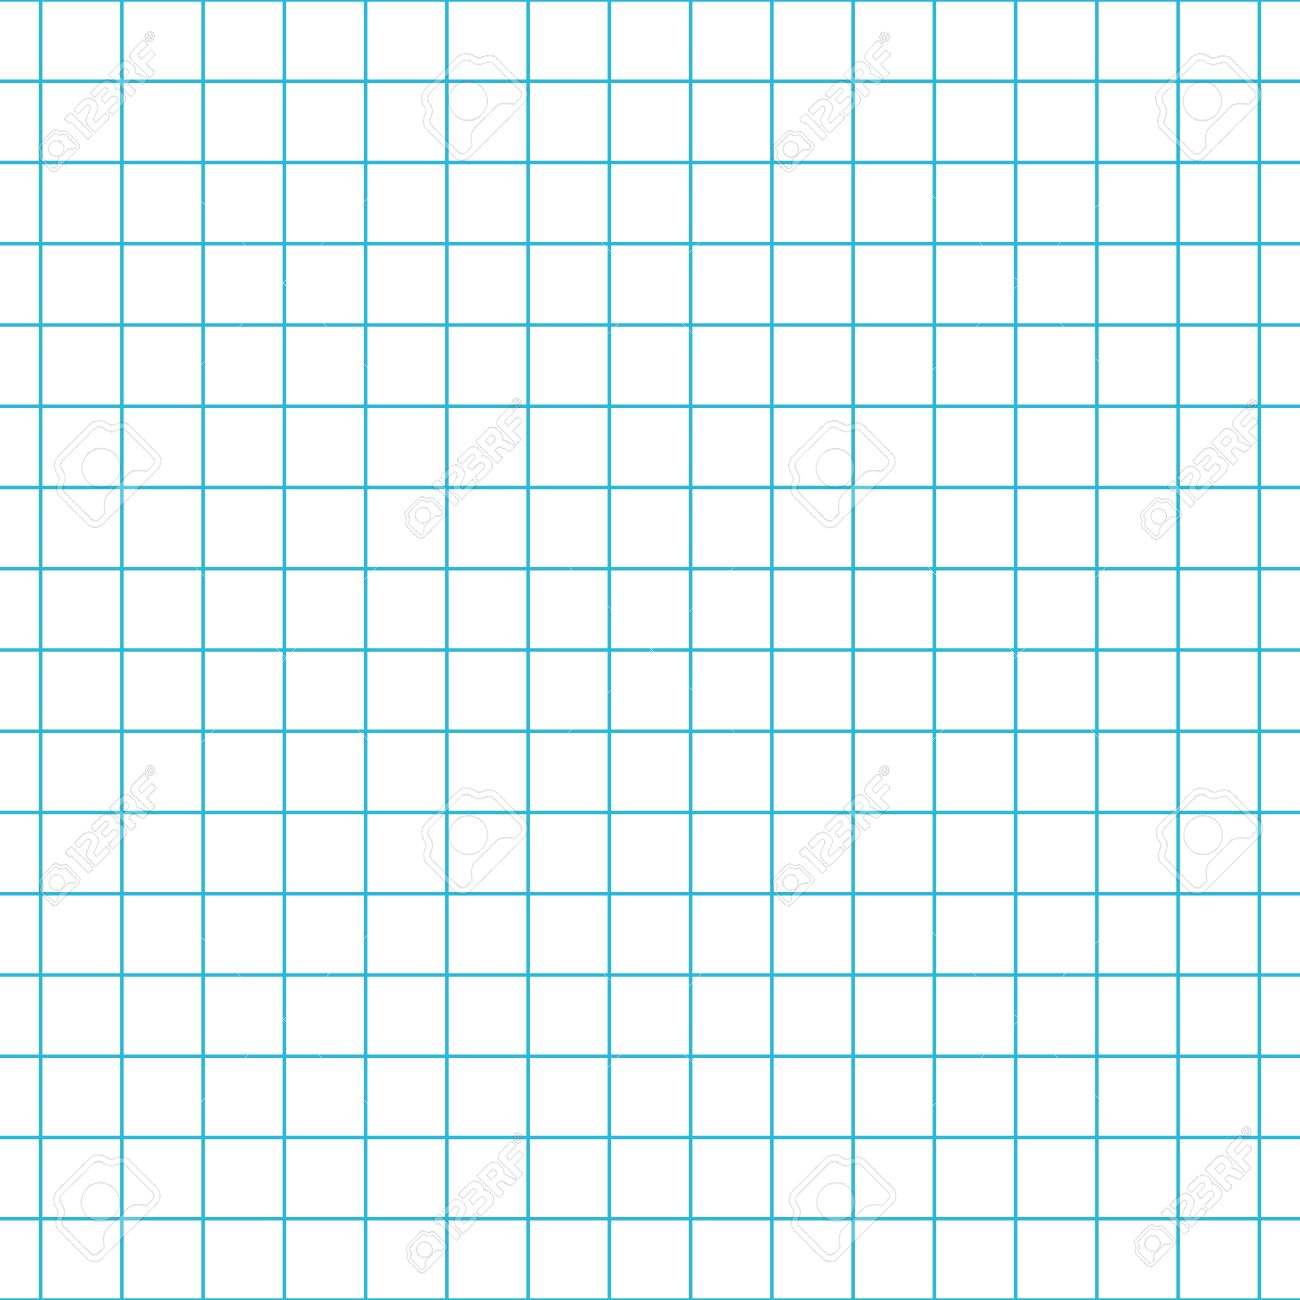 checkered notebook paper vector seamless pattern graph paper rh 123rf com graph paper vector free download graph paper vector download